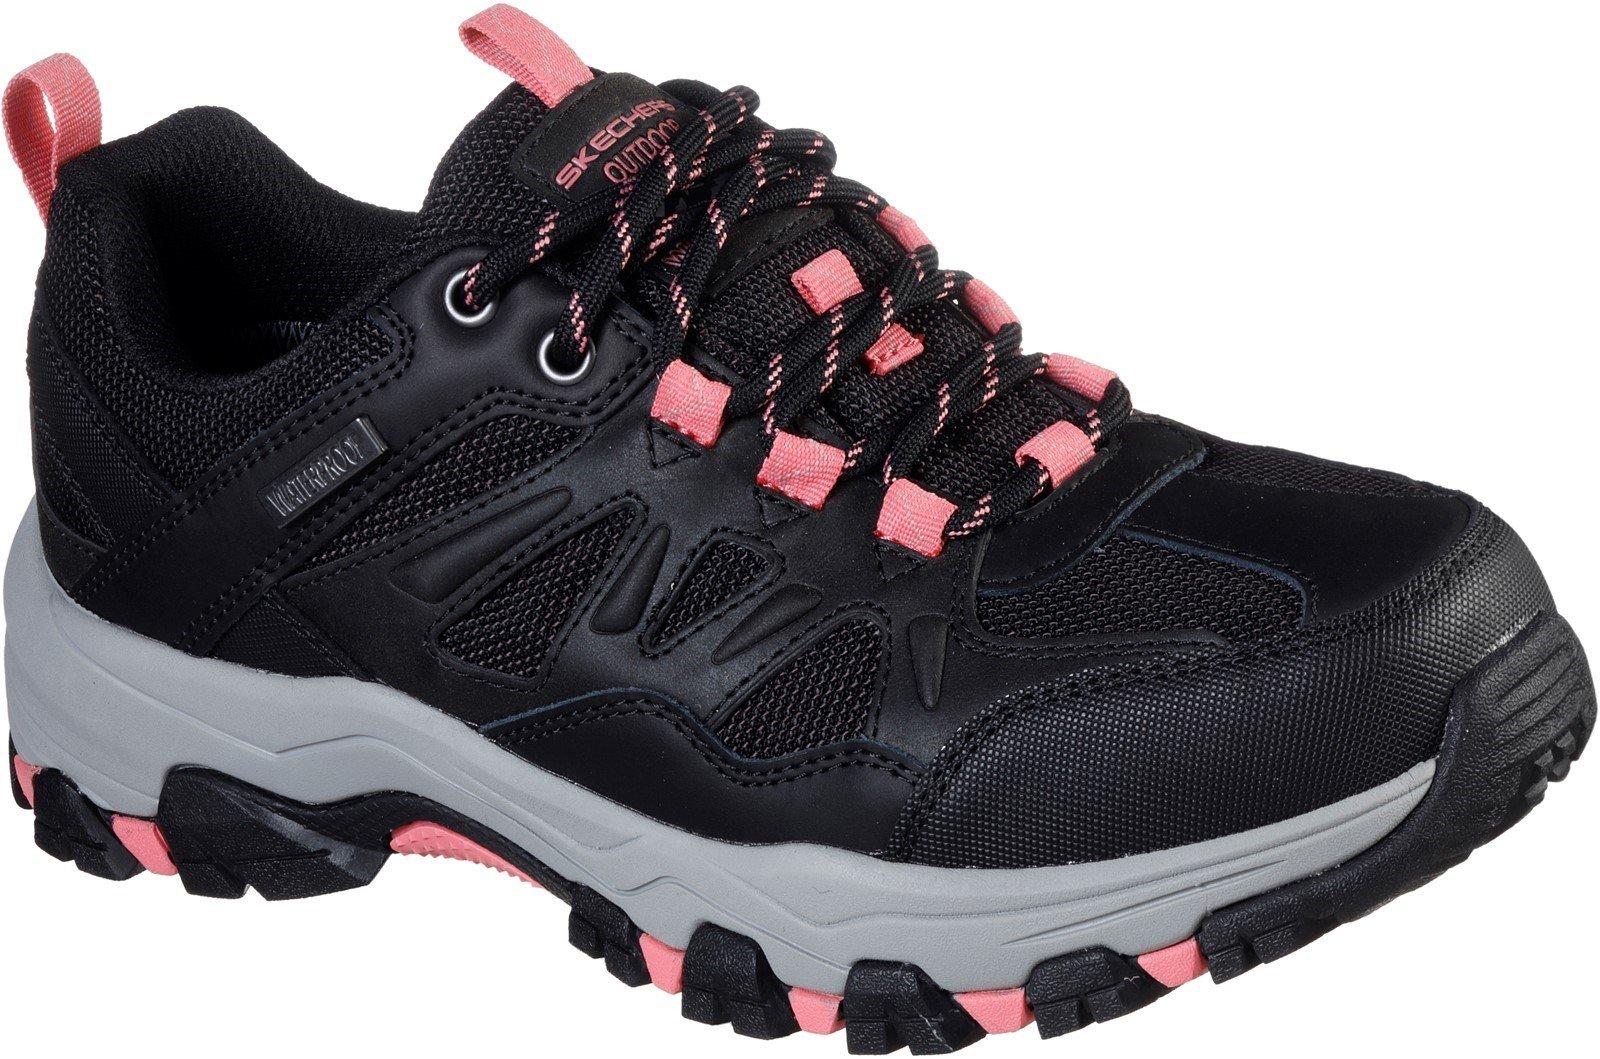 Skechers Women's Selmen West Highland Hiking Trainer Various Colours 32128 - Black/Charcoal 3